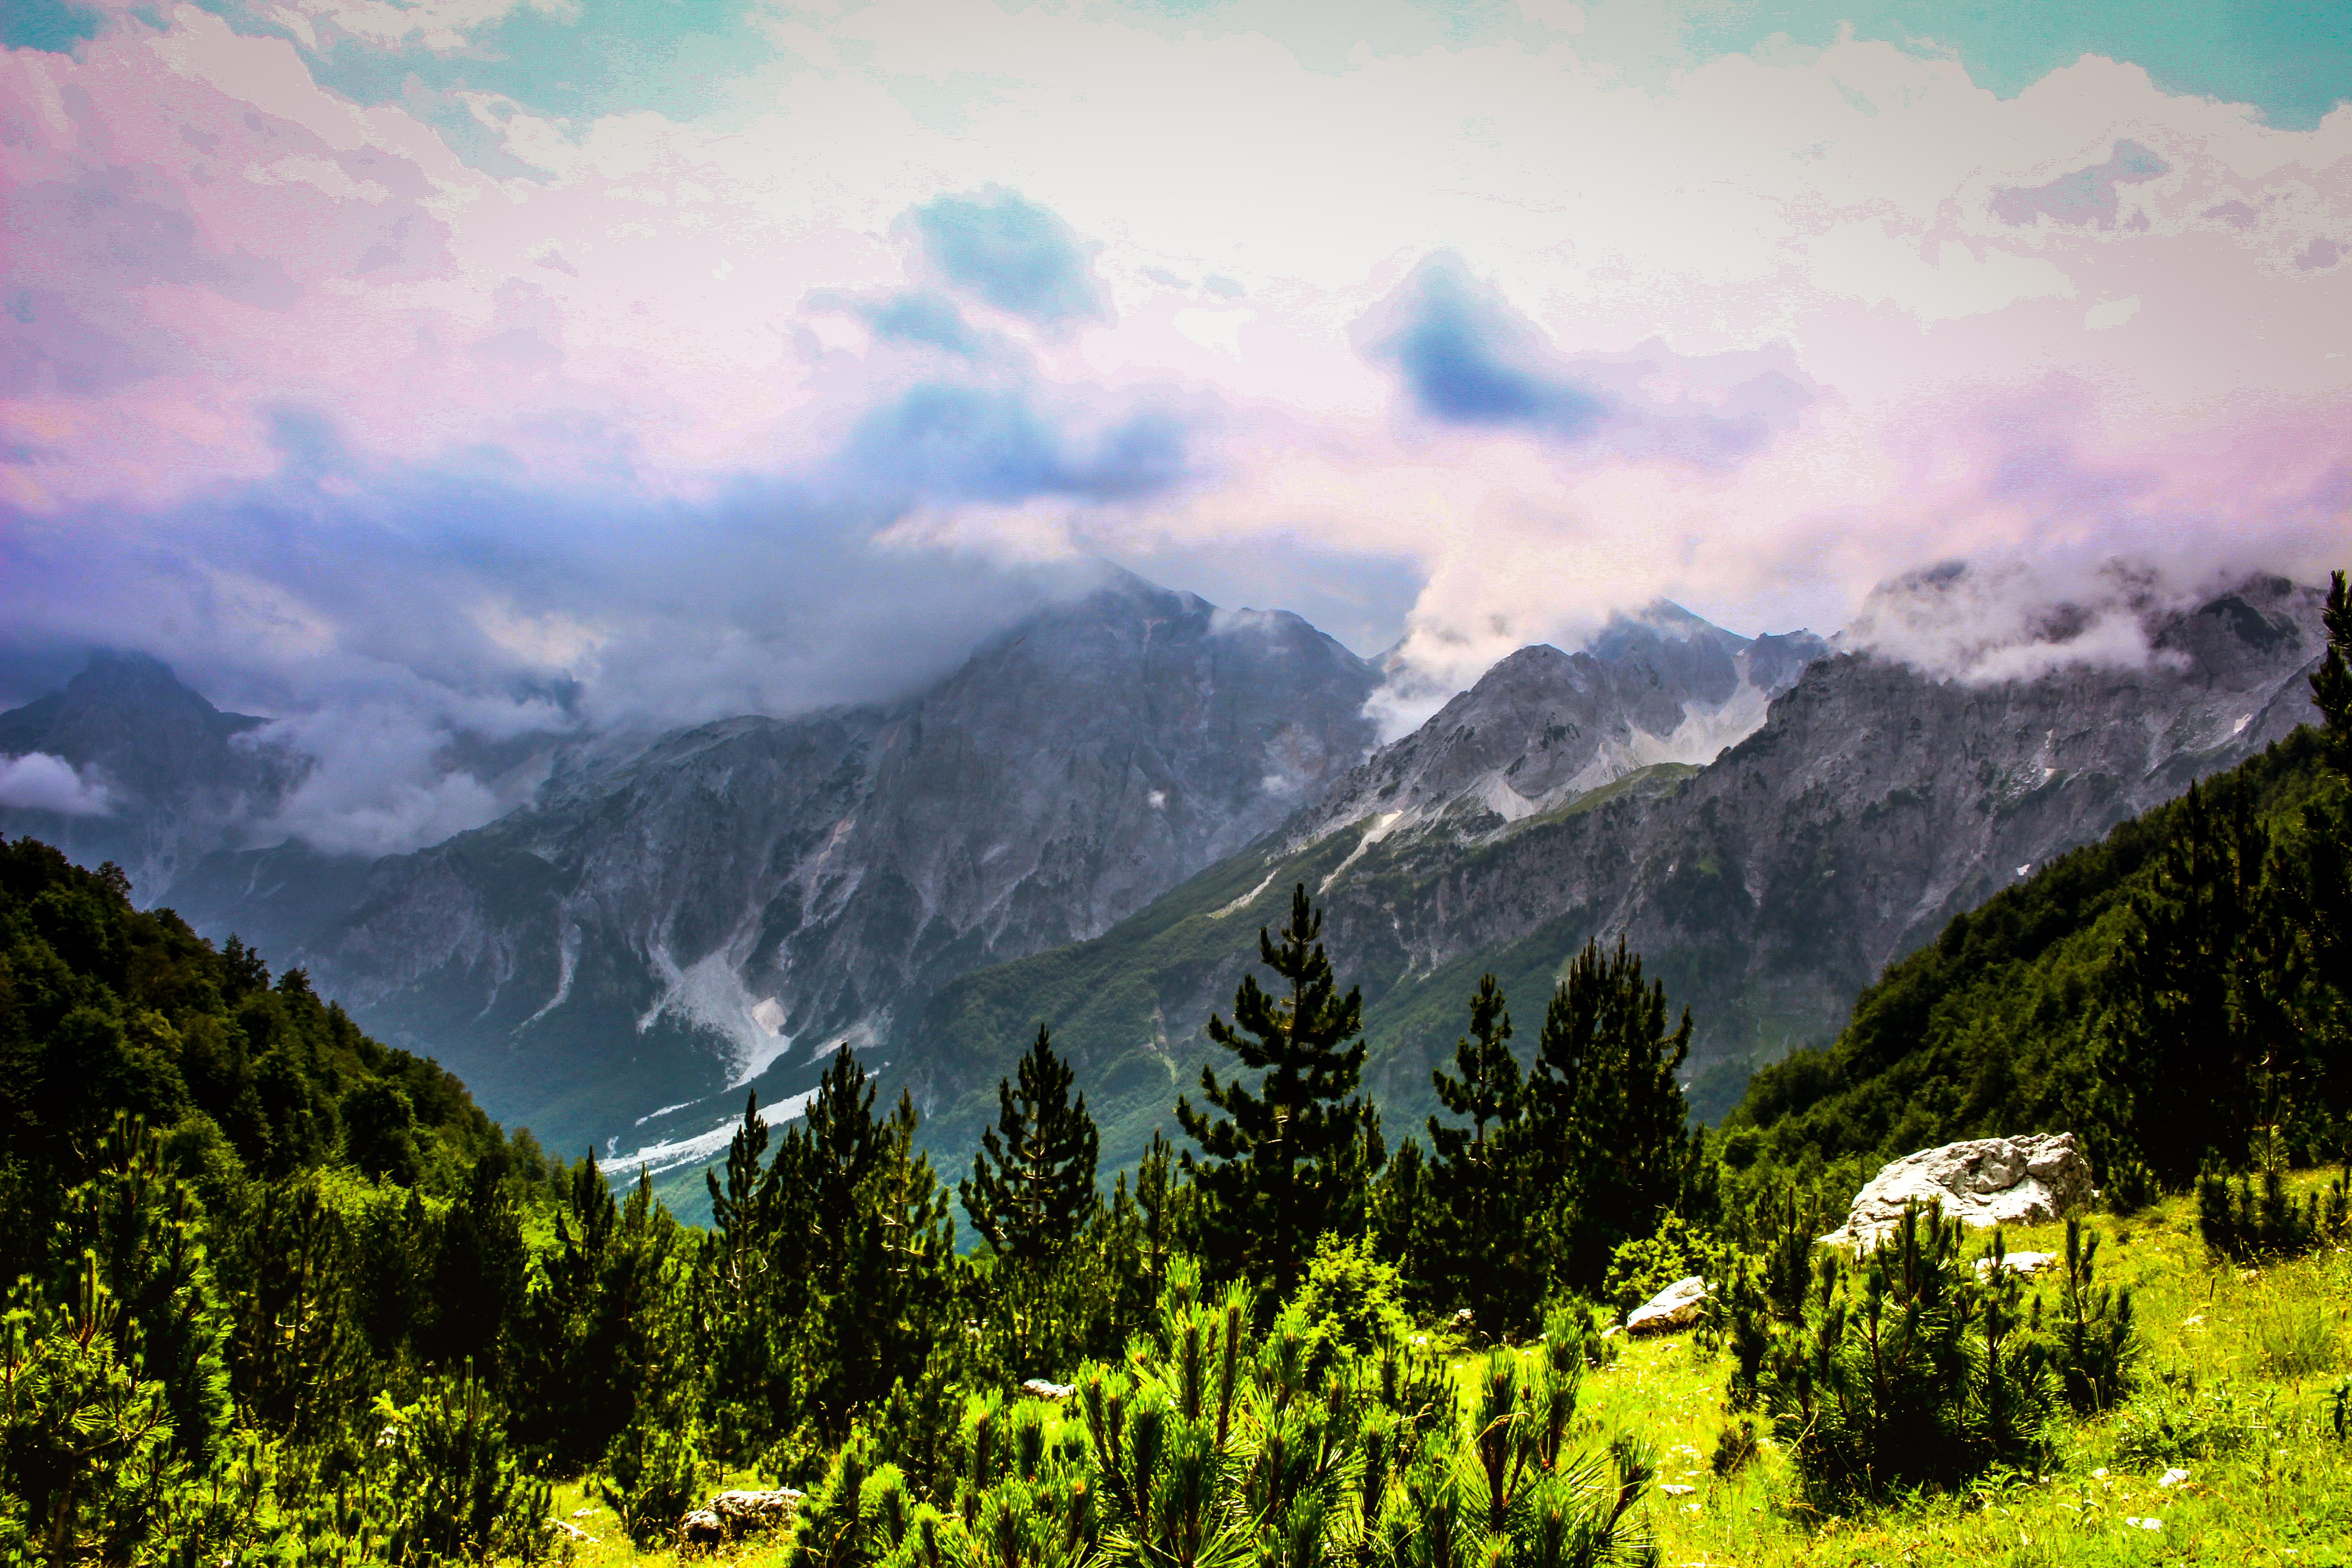 albanian-alps